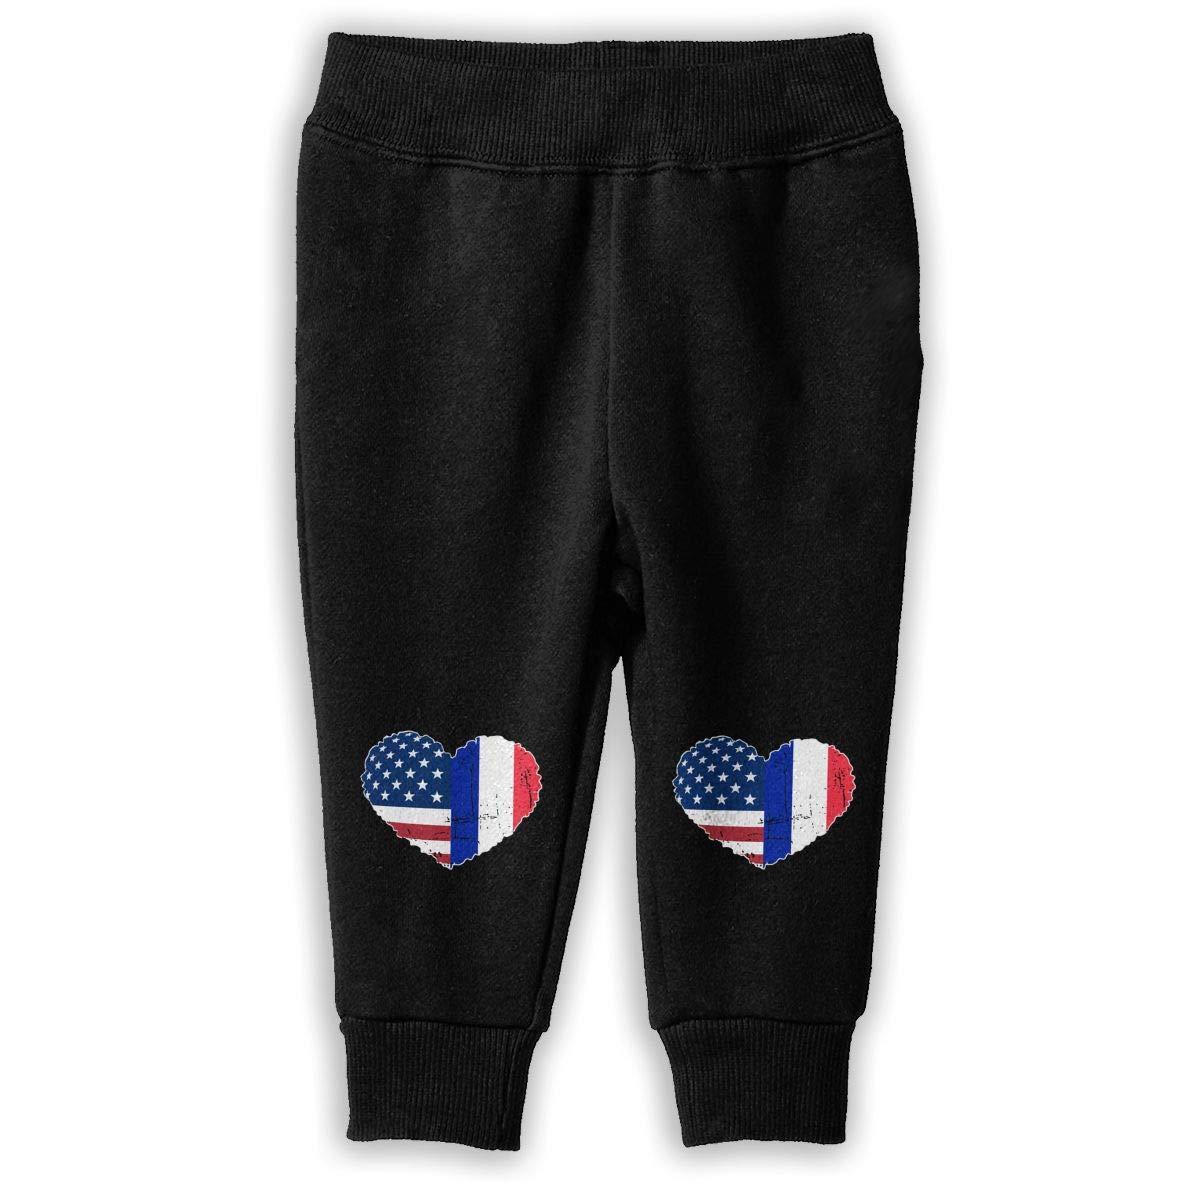 Toddler Training Pants NJKM5MJ France USA Flag Heart Sweatpants